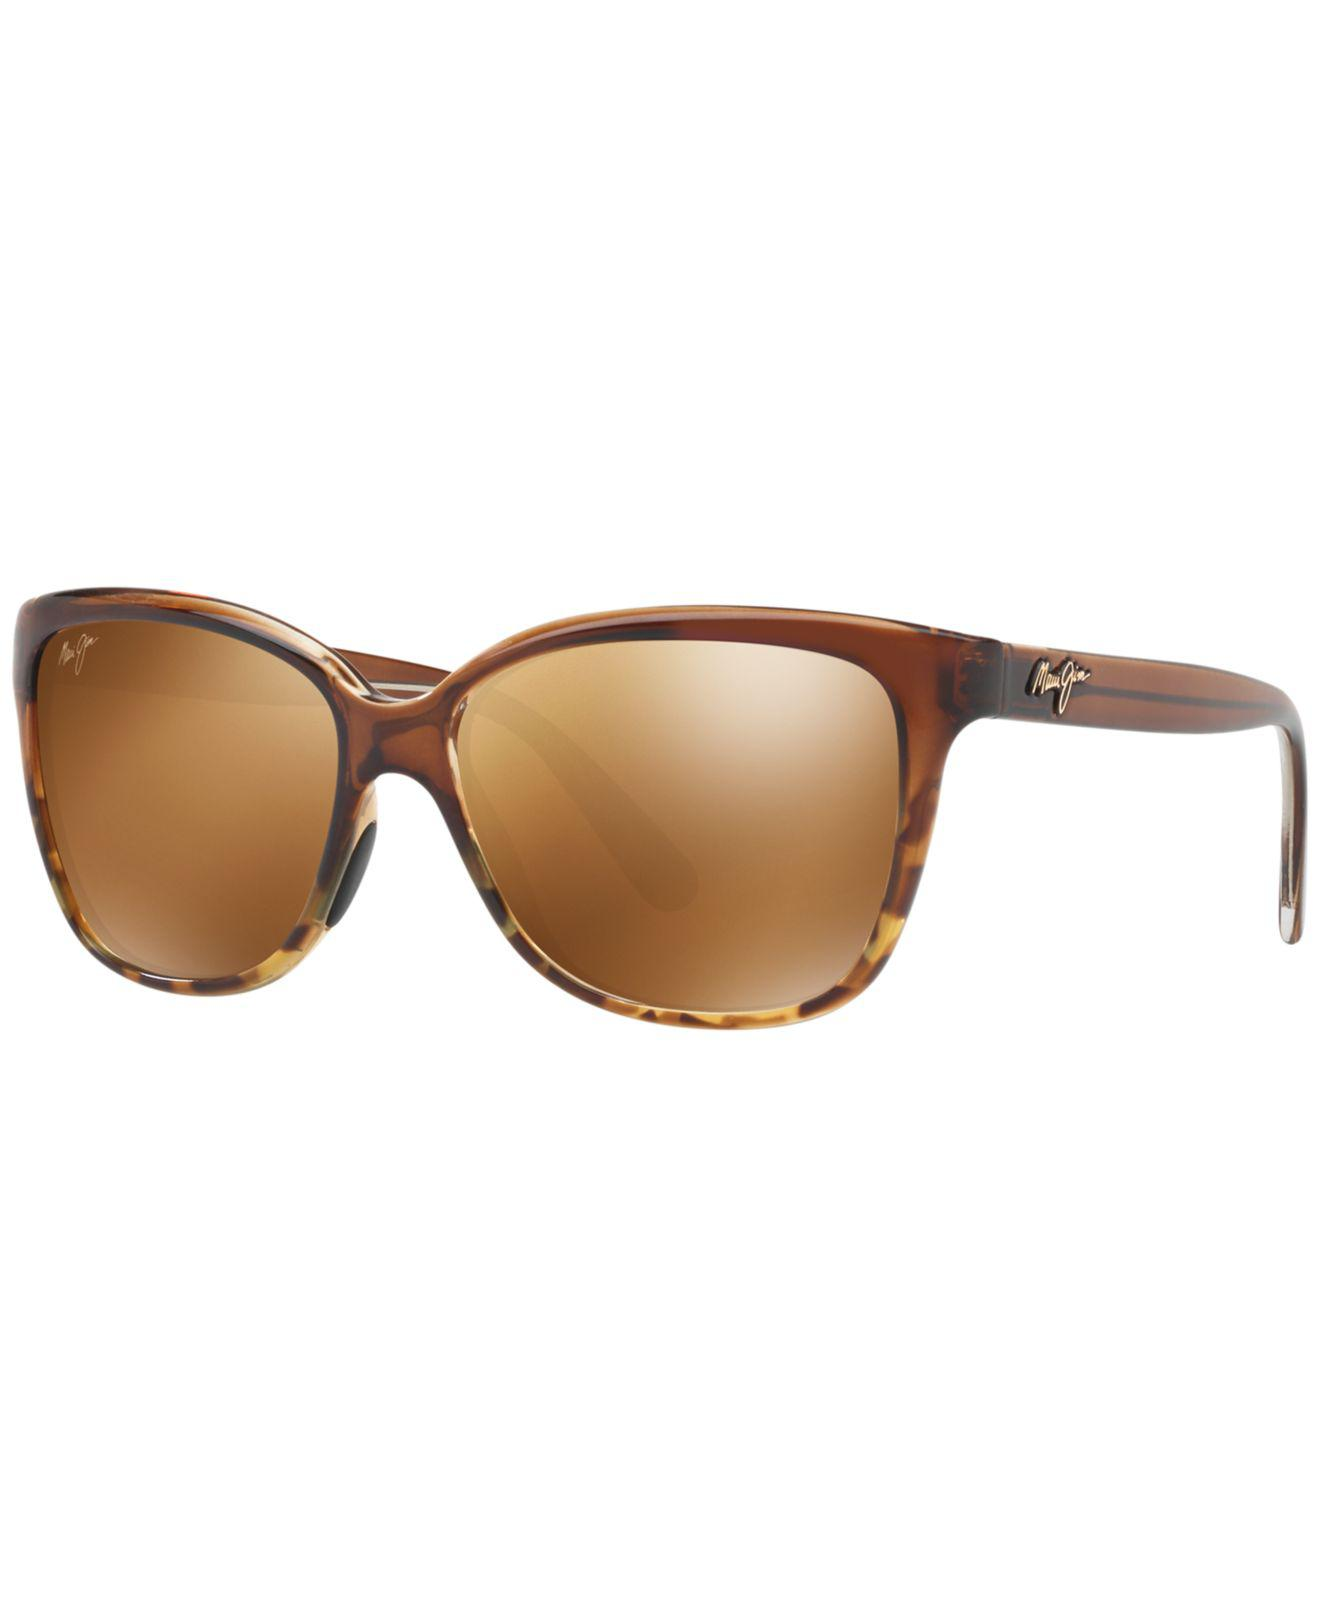 f992193db6 Lyst maui jim starfish sunglasses in brown jpg 1320x1616 Starfish sandstone  color polarized lenses sunglasses